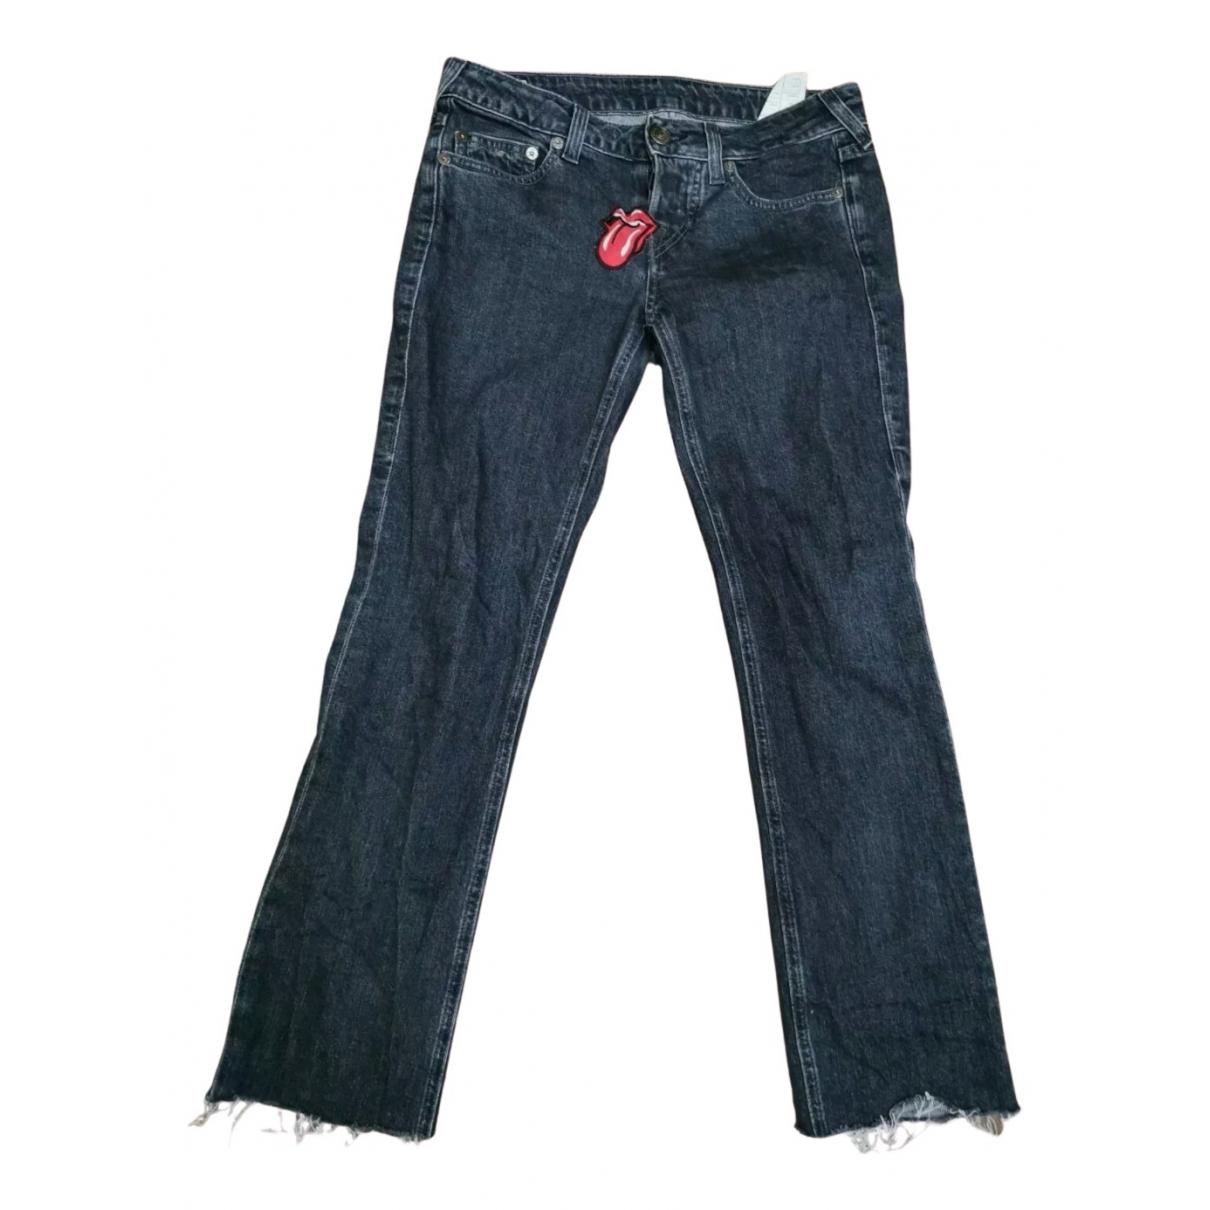 True Religion N Grey Cotton Jeans for Women 26 US